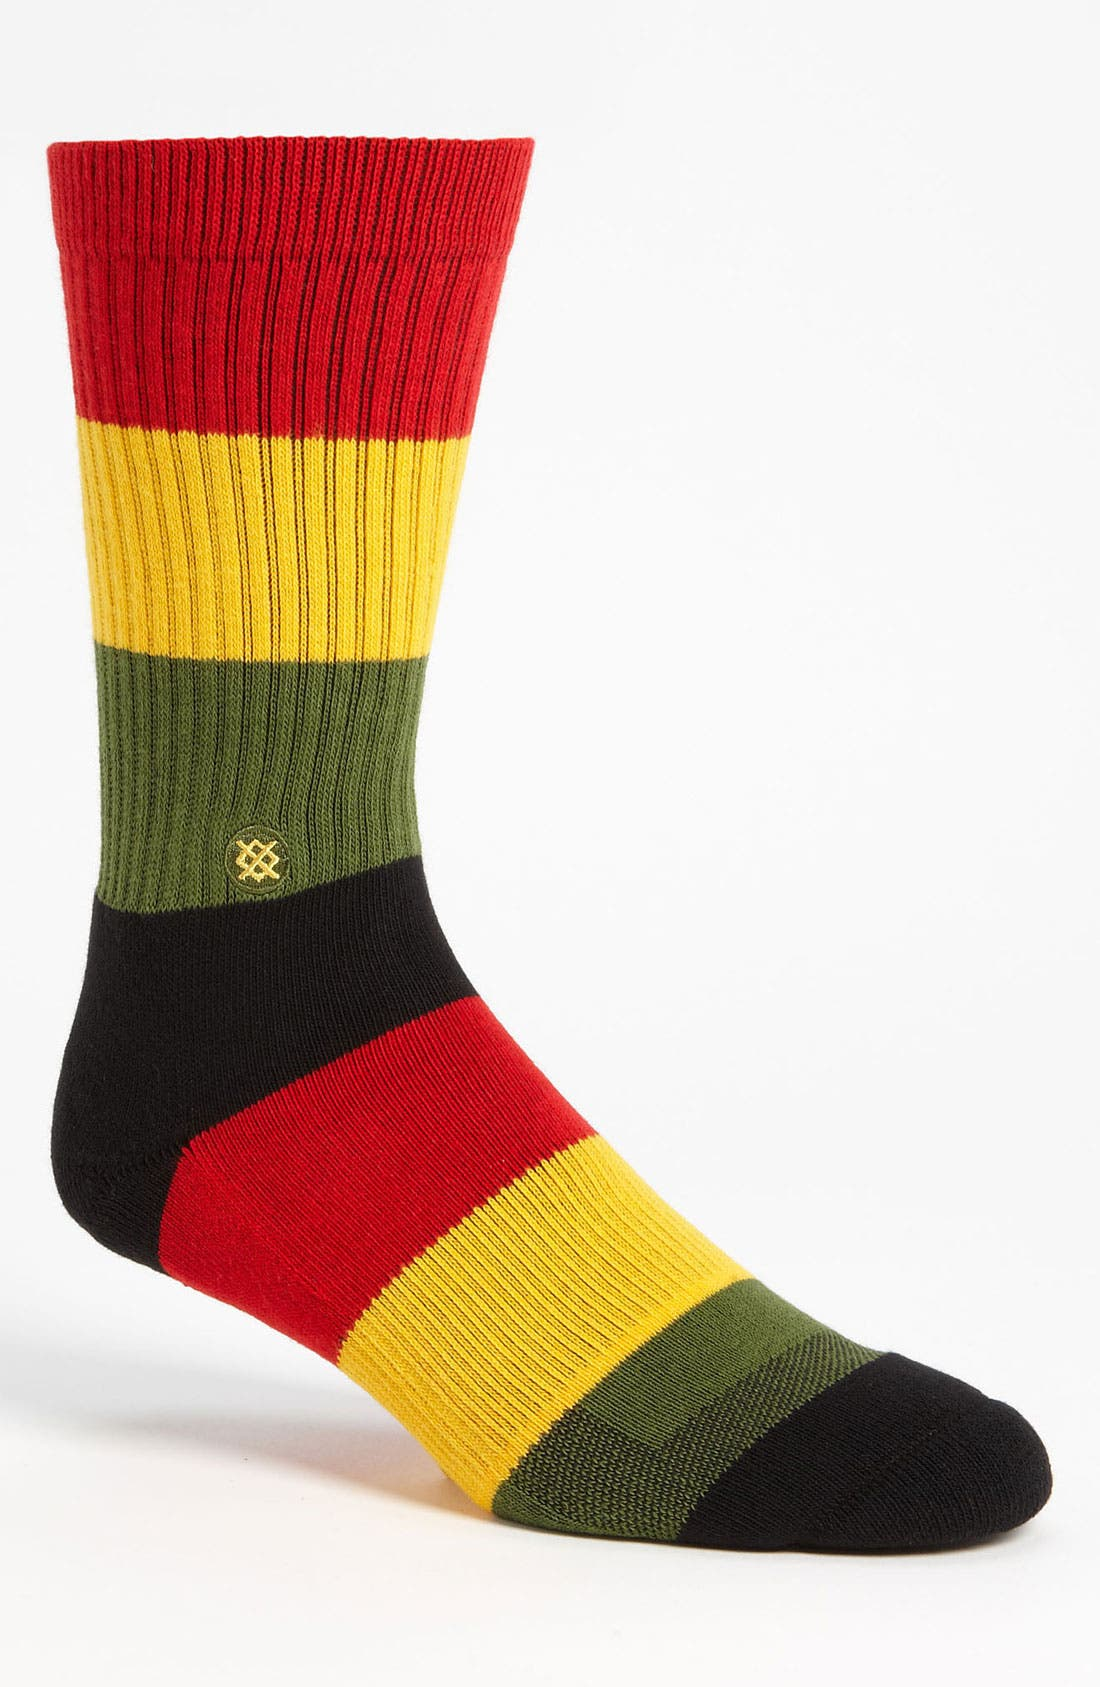 Main Image - Stance 'Maytal' Socks